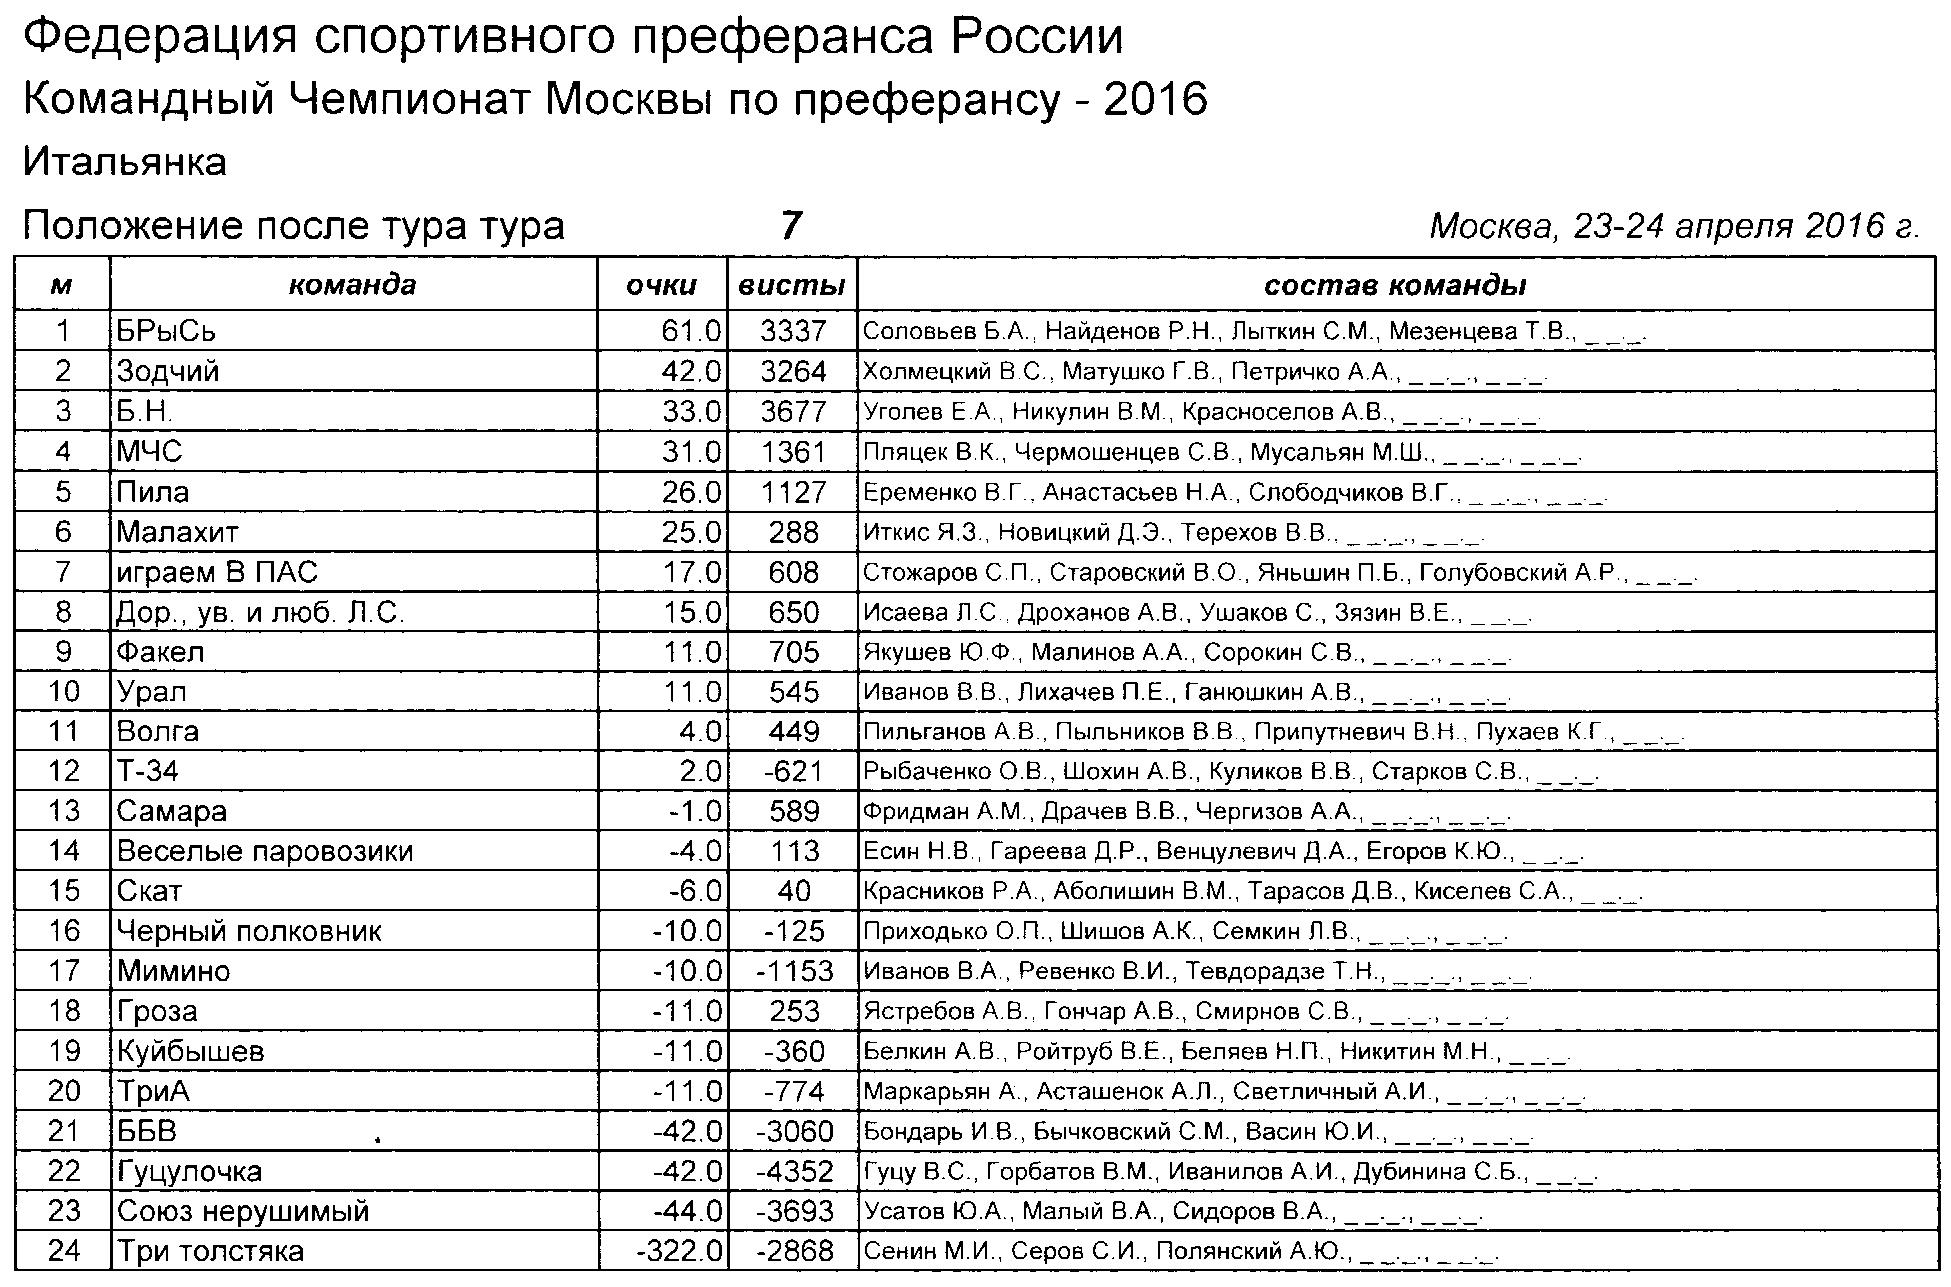 http://s3.uploads.ru/v17Bx.png